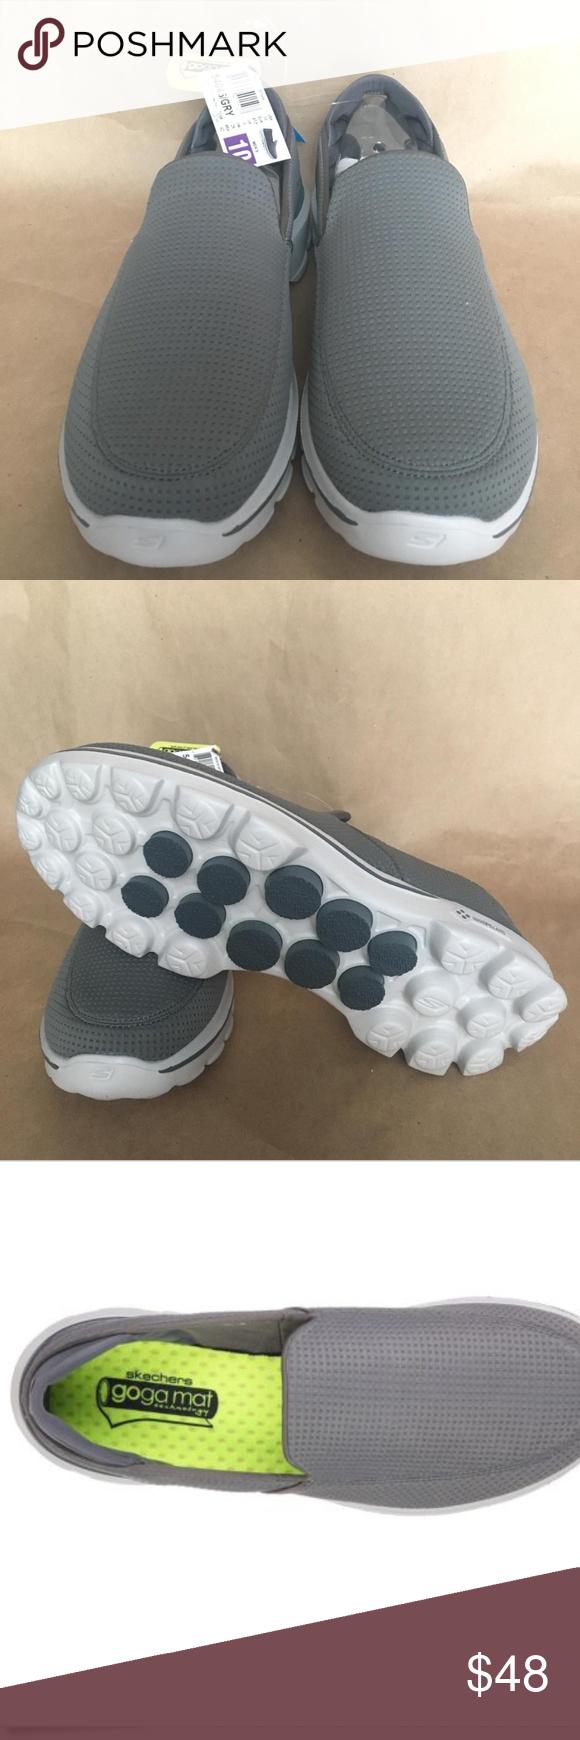 Pensamiento Charlotte Bronte habilidad  SKECHERS Mens GOWALK 3 walking activity shoes B   Skechers performance,  Clothes design, Fashion